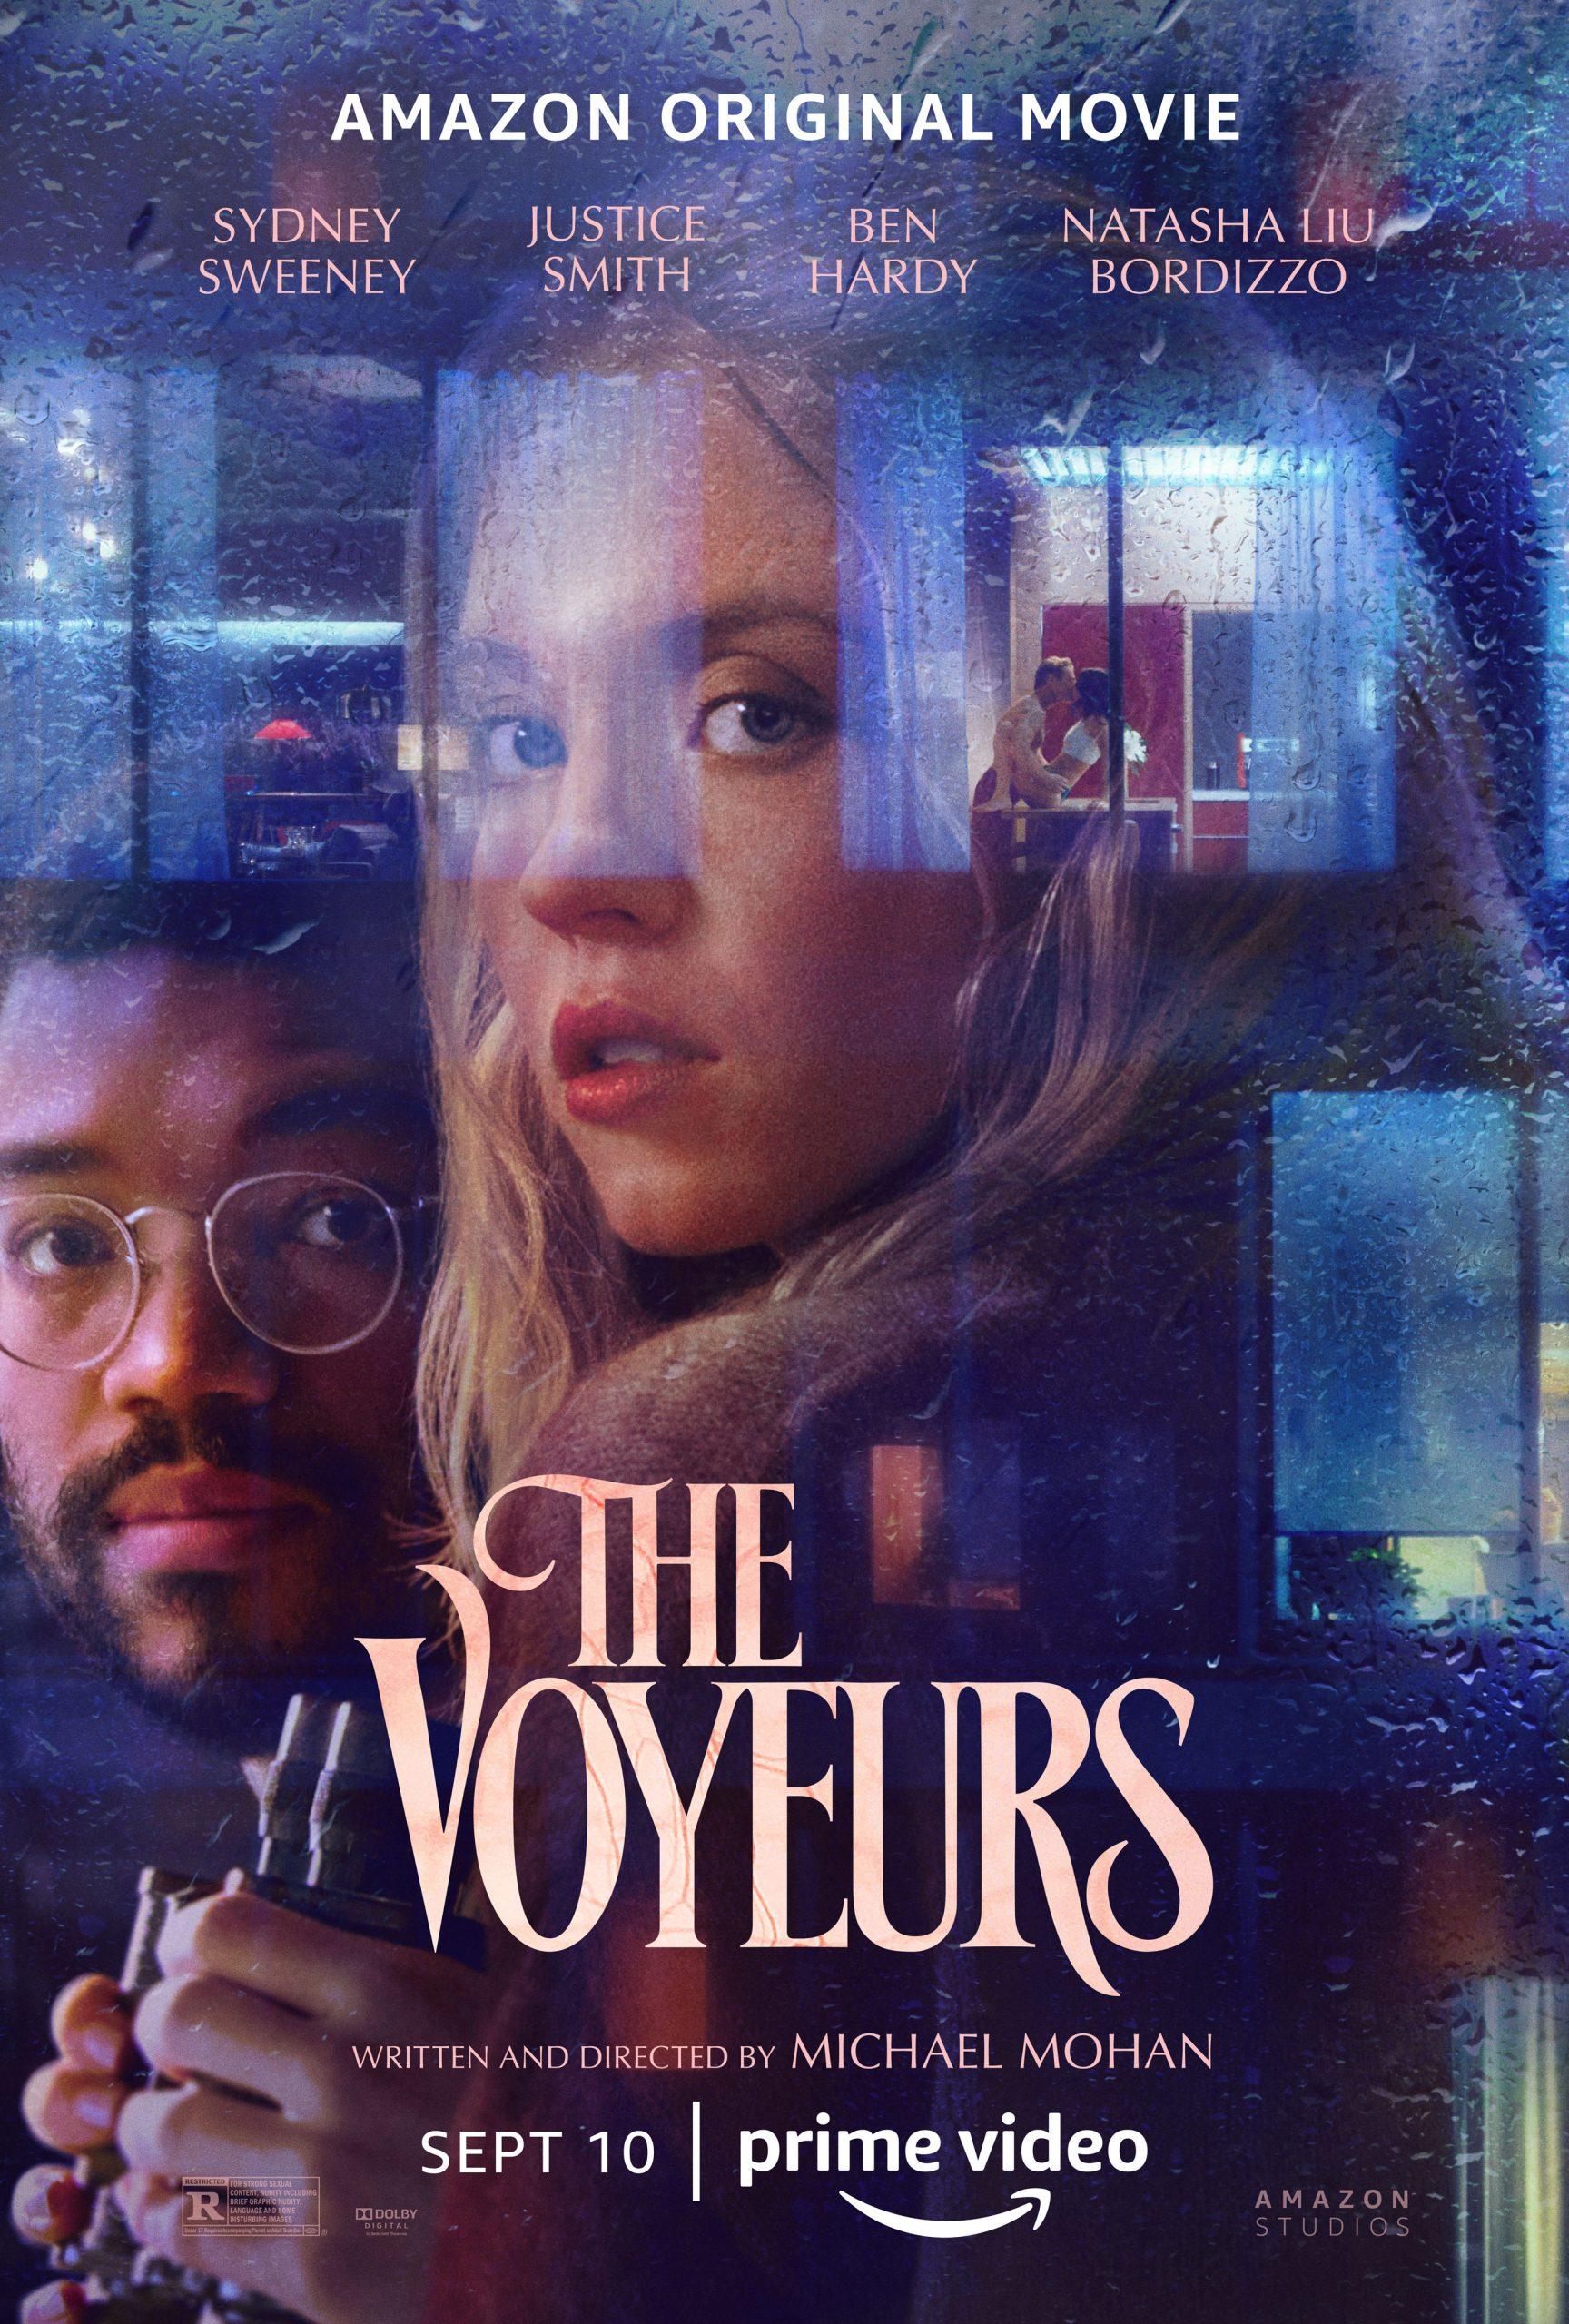 Amazon Prime The Voyeurs Release Date, Sydney Sweeney Cast, Trailer, Plot, Story